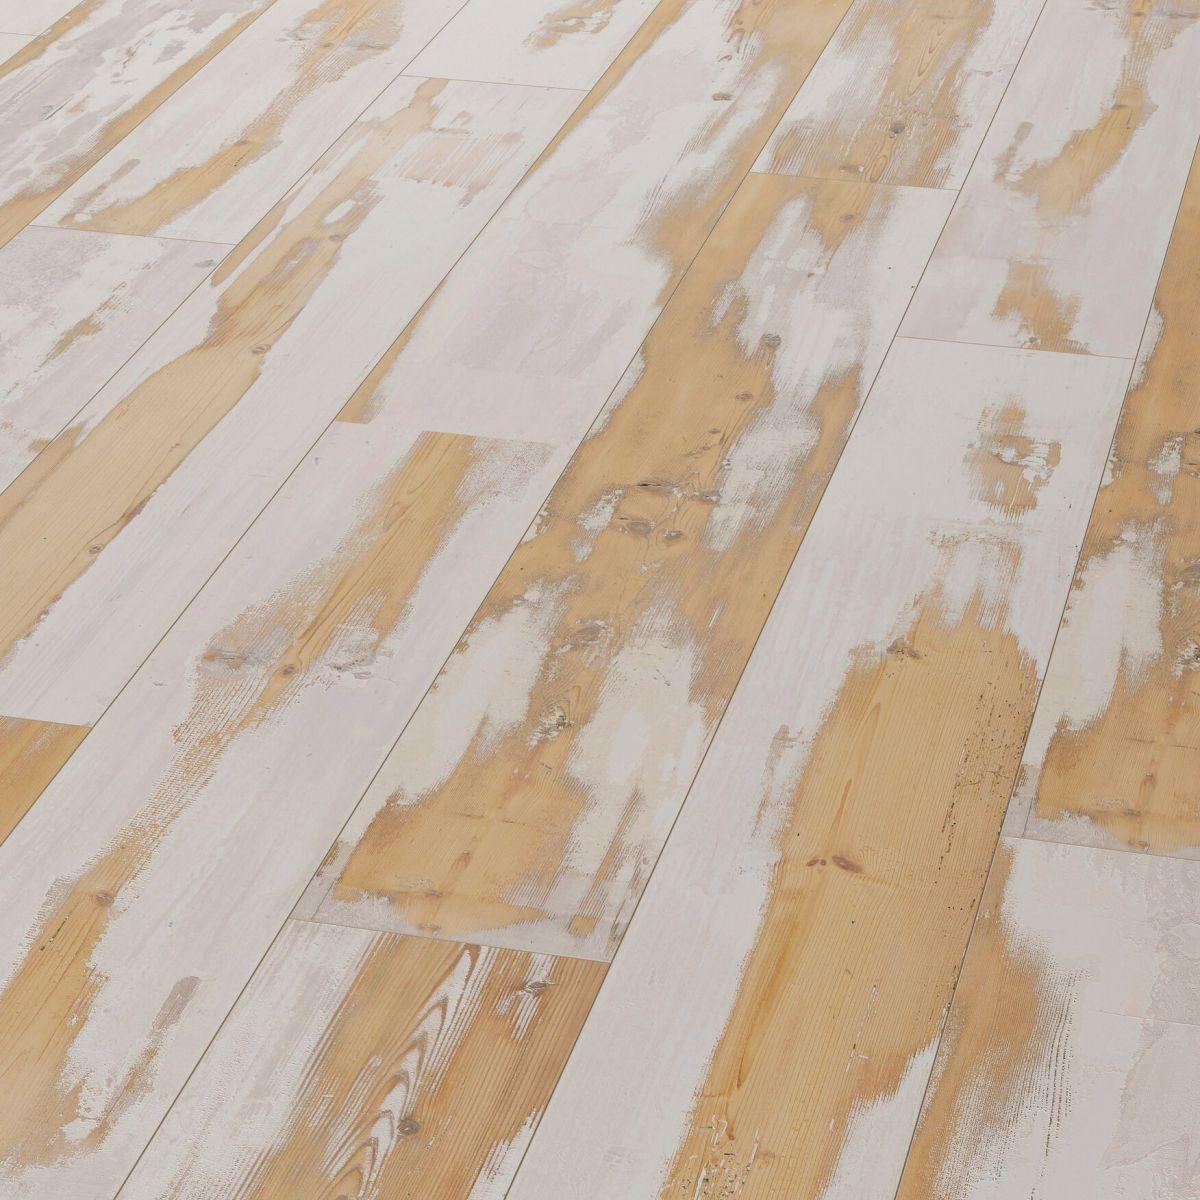 Avatara vloer hout K06 diagonaal